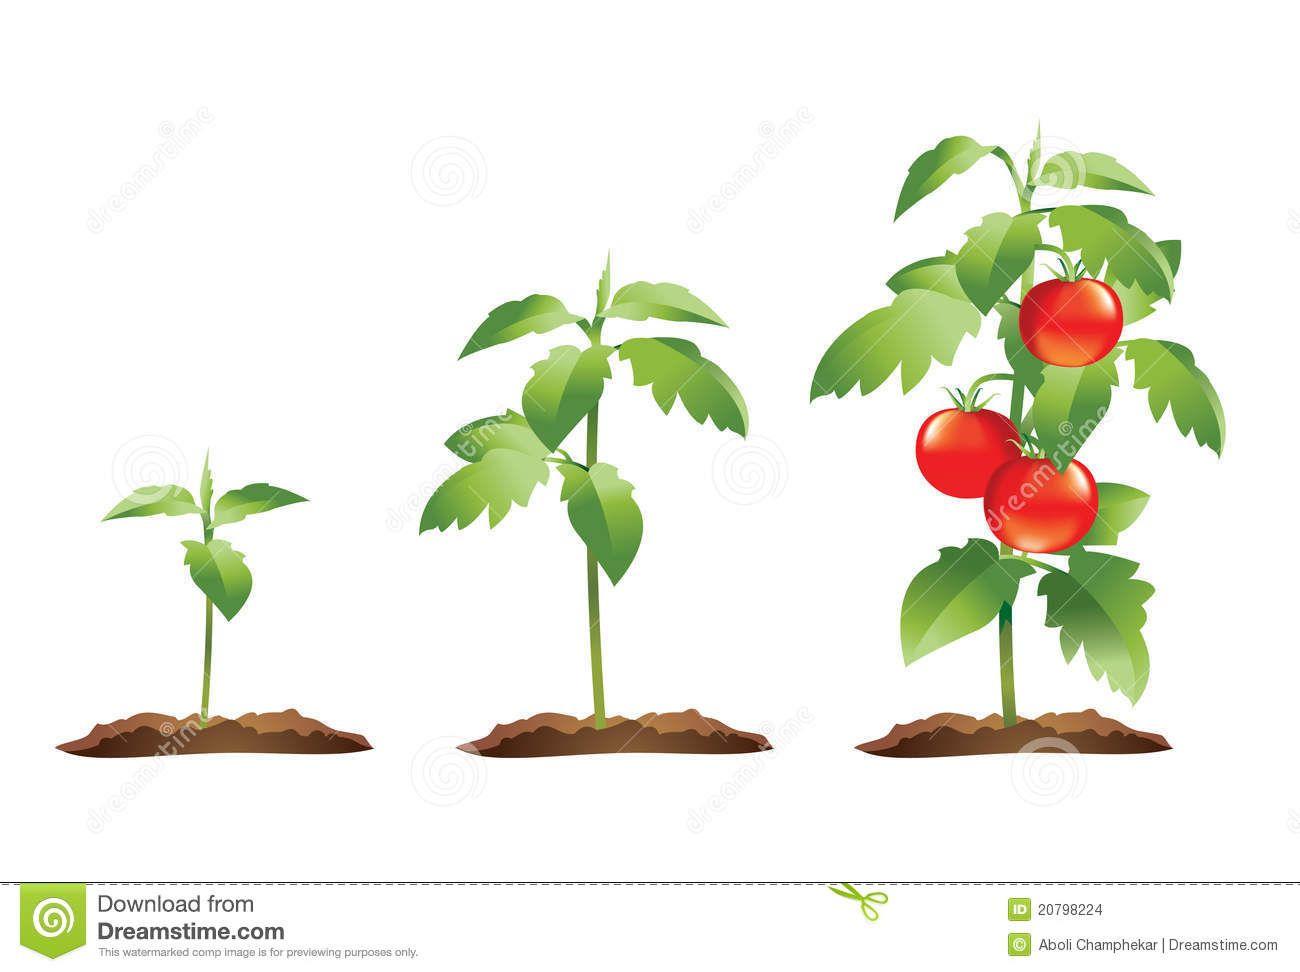 Tomato stock photo image. Tomatoes clipart eggplant plant